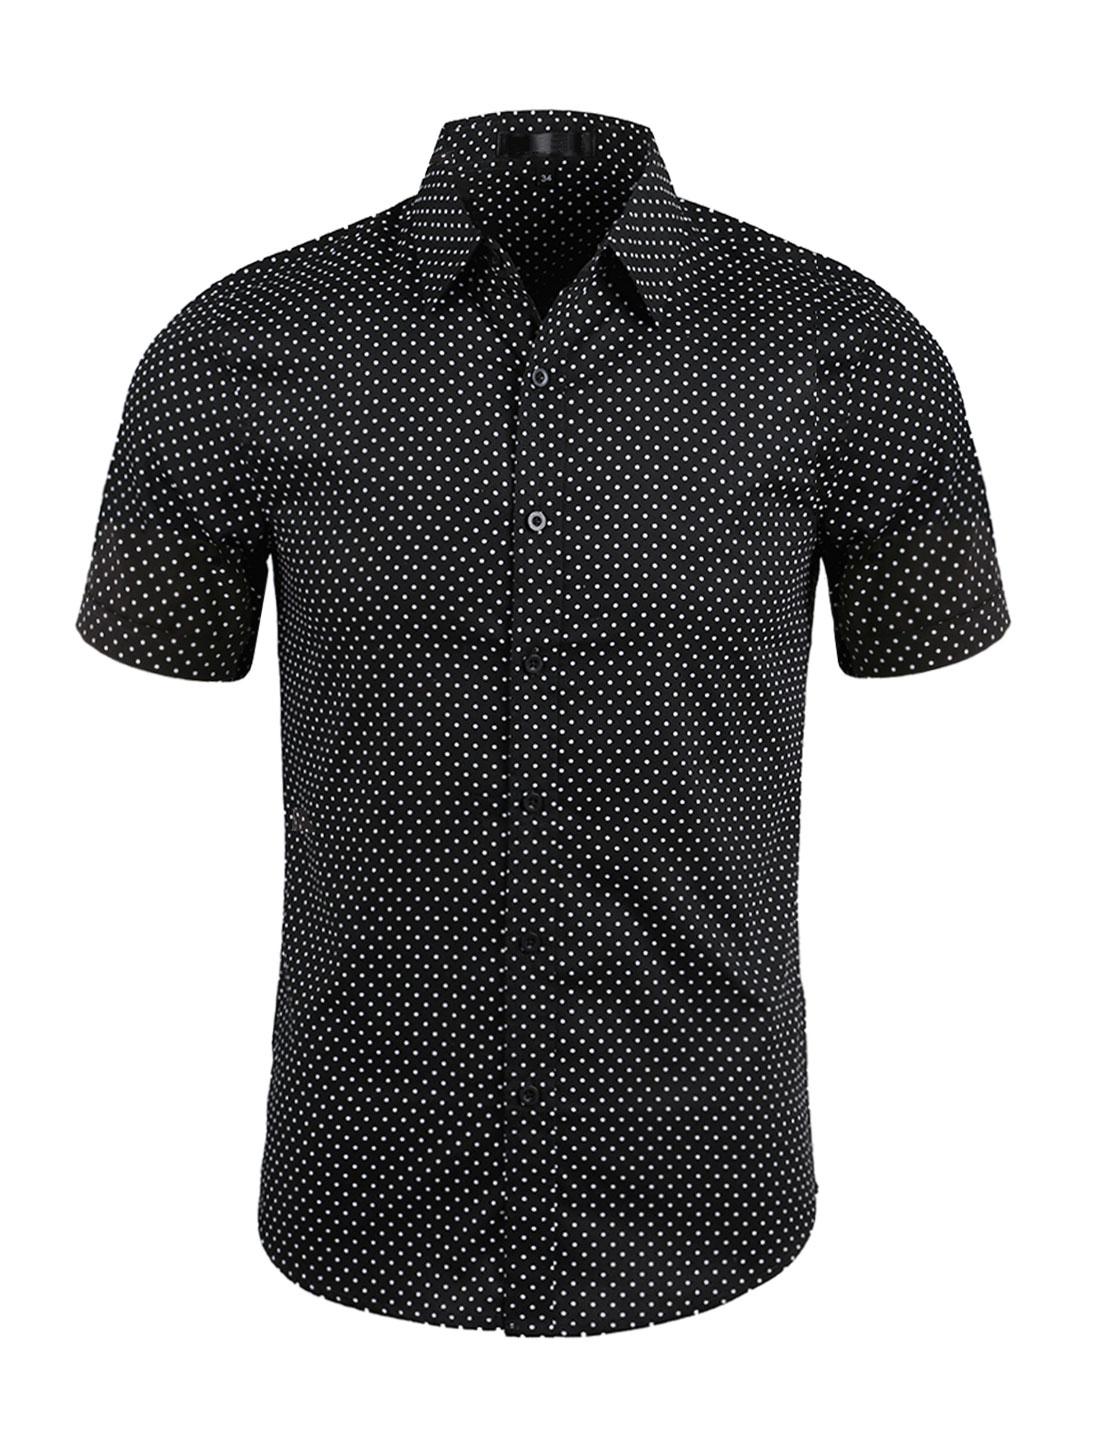 Men Dots Point Collar Short Sleeves Button Down Shirt Black L